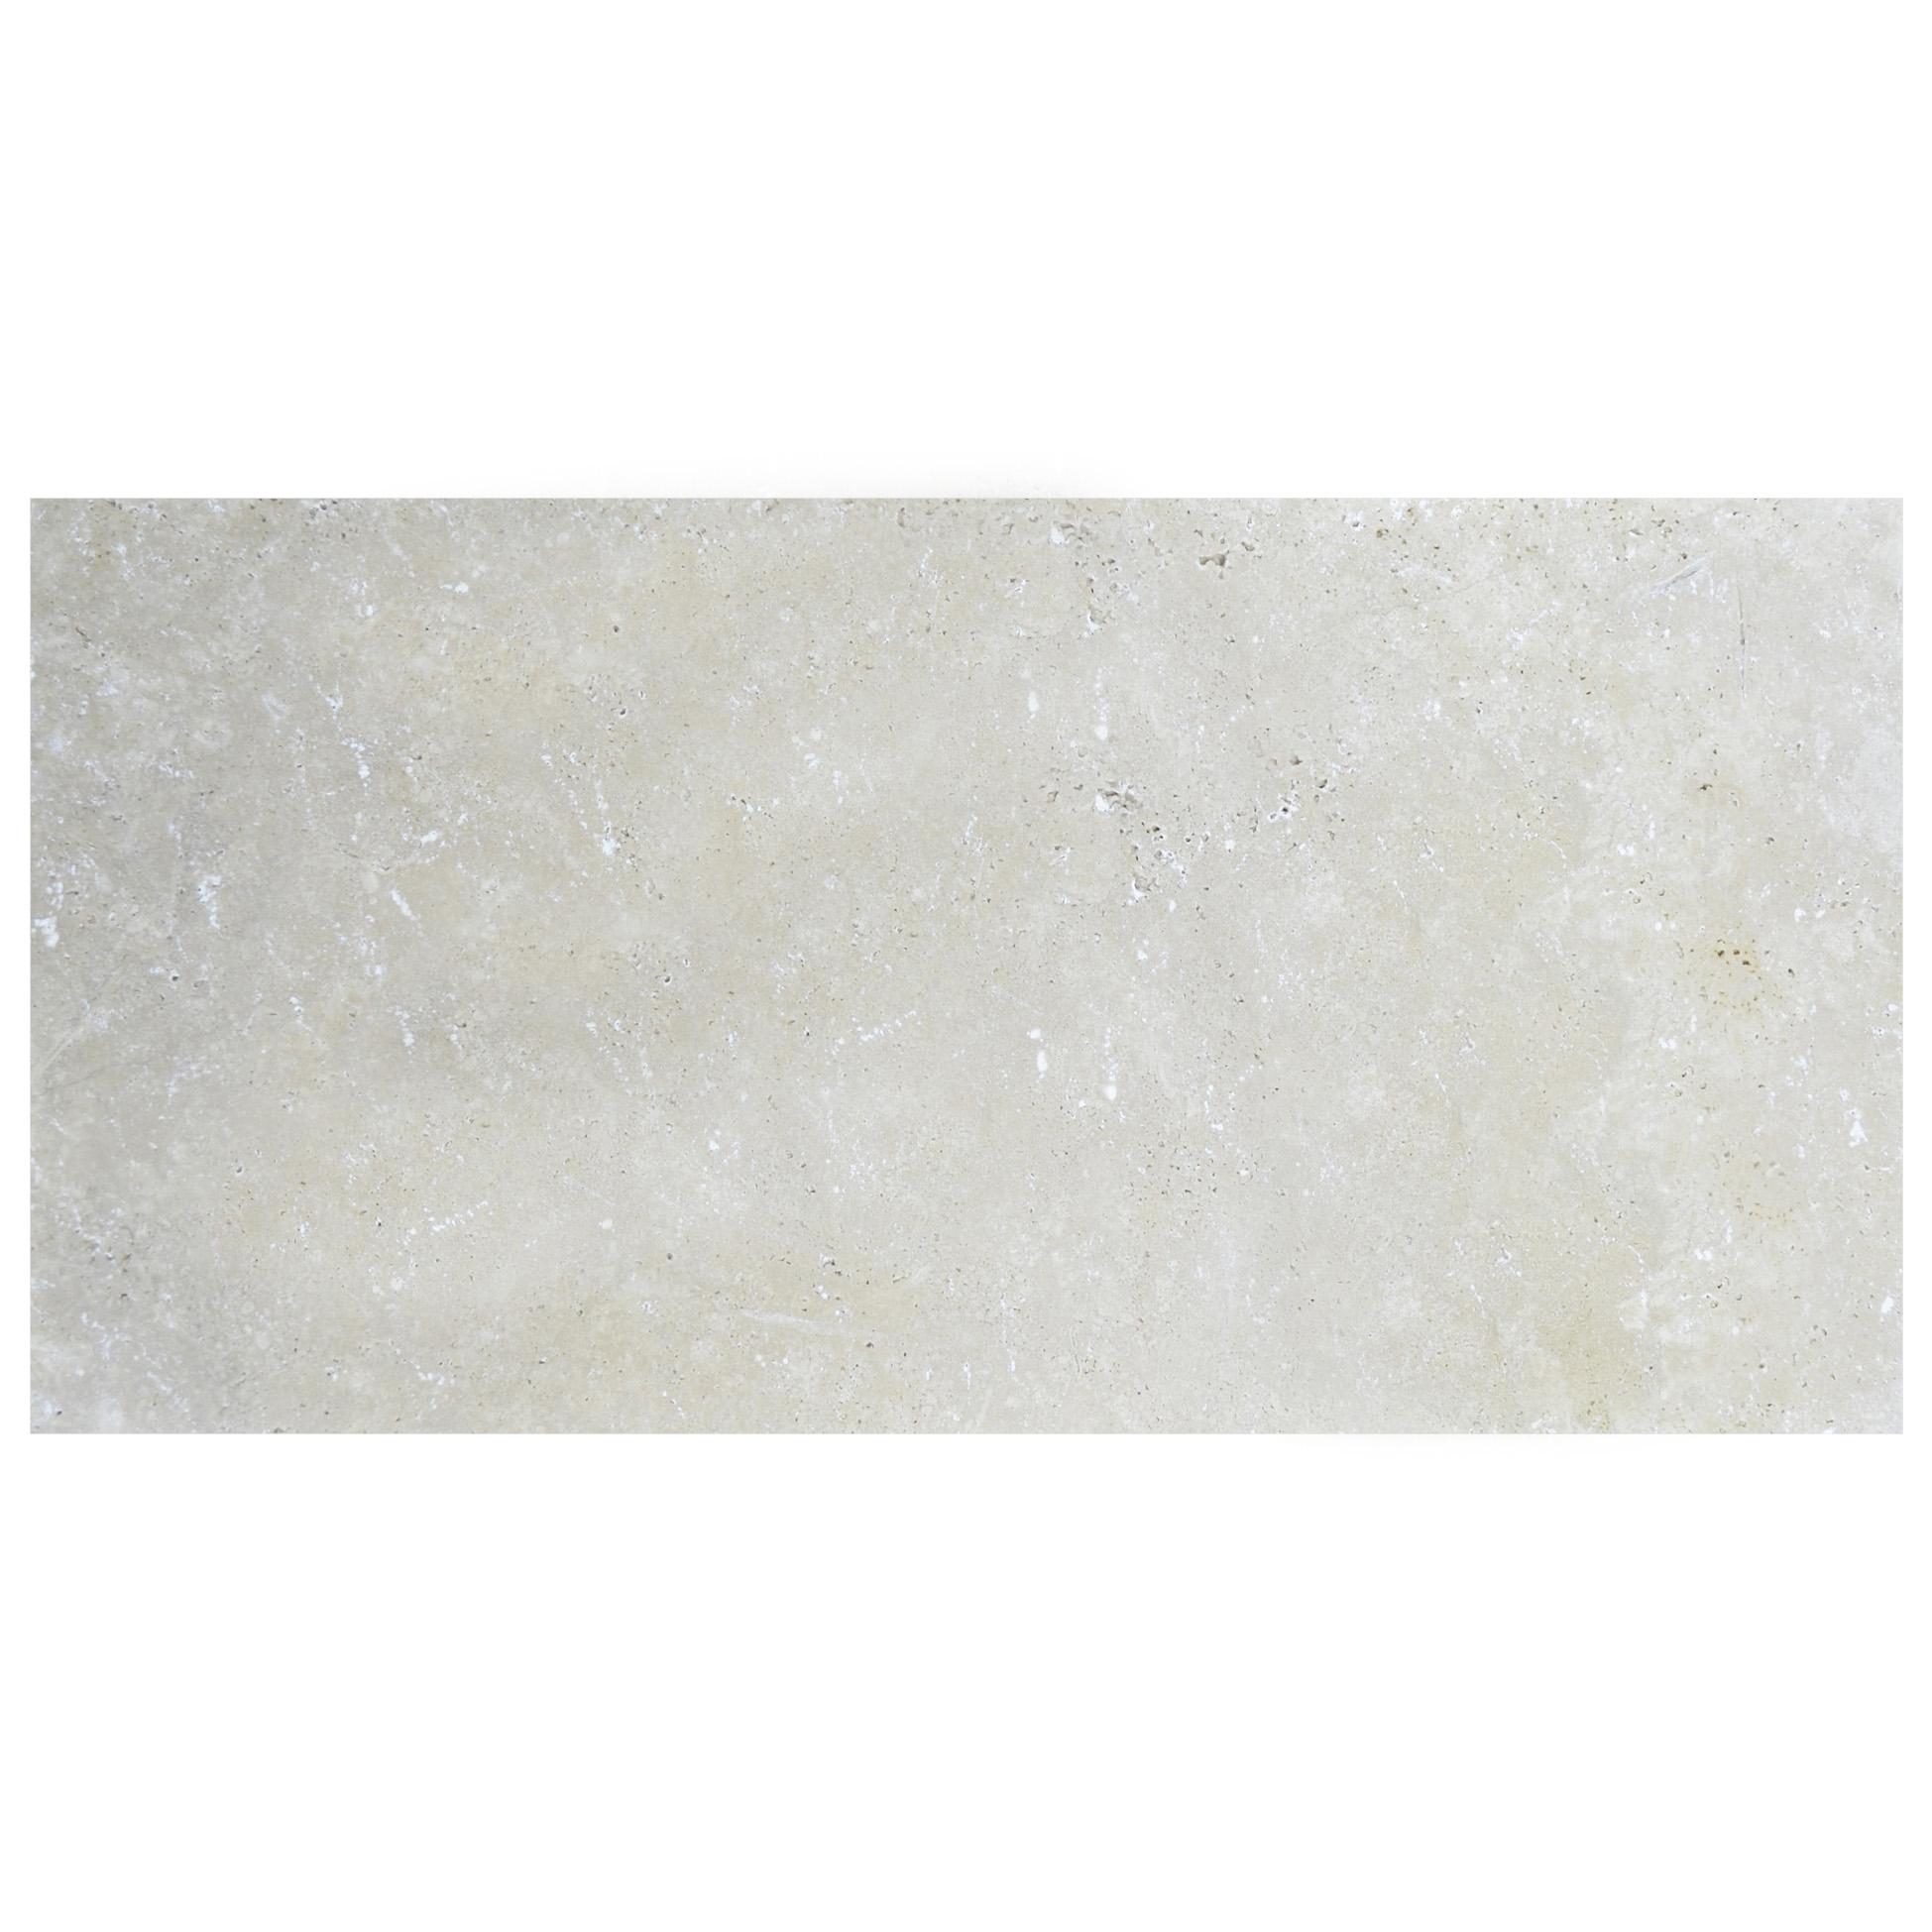 Ivory Tumbled Travertine Pavers 12x24-pavers sale-Atlantic Stone Source